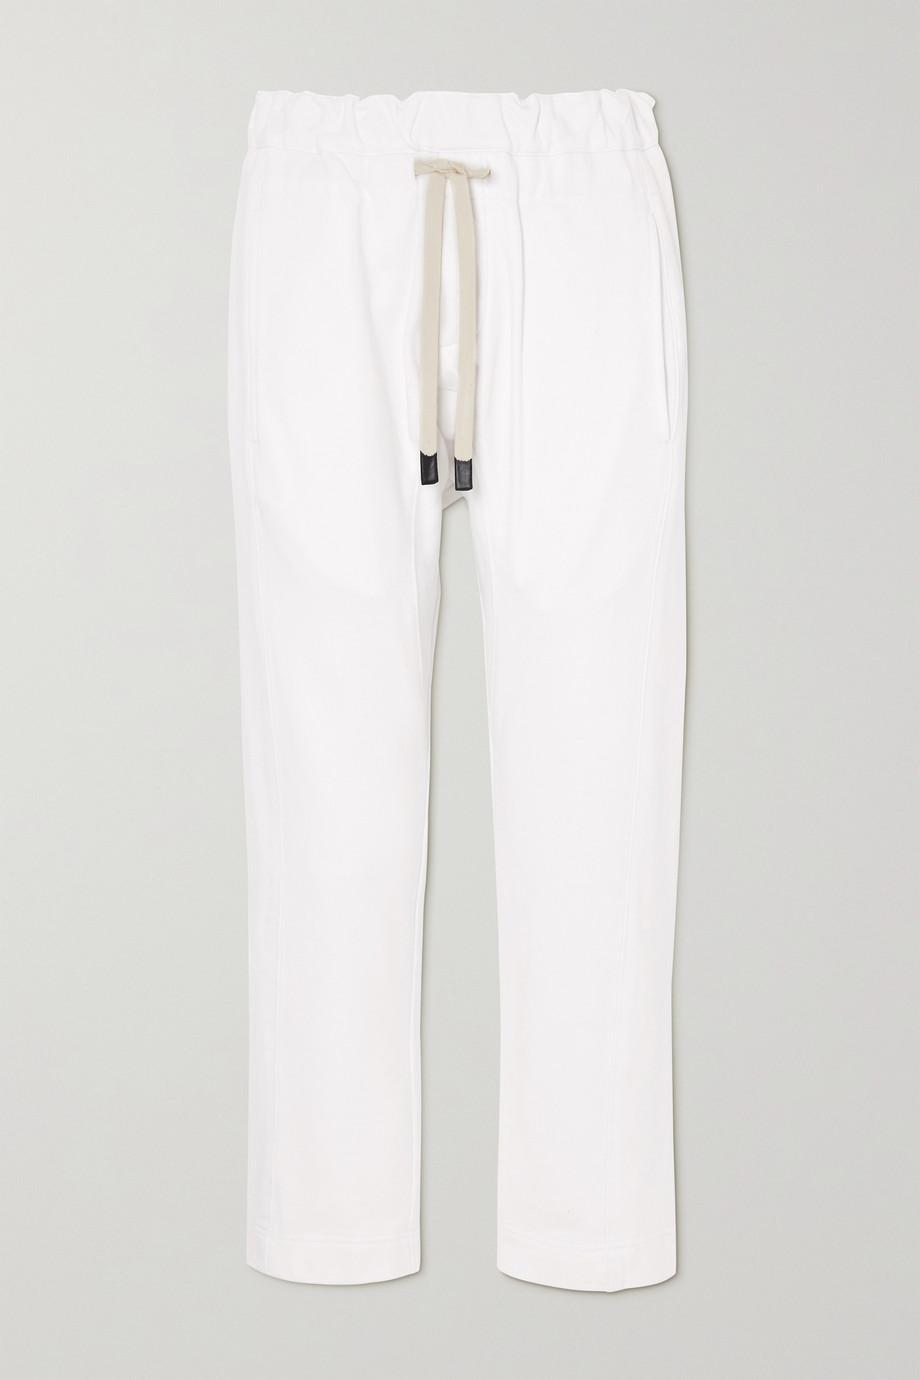 Bassike + NET SUSTAIN organic cotton track pants